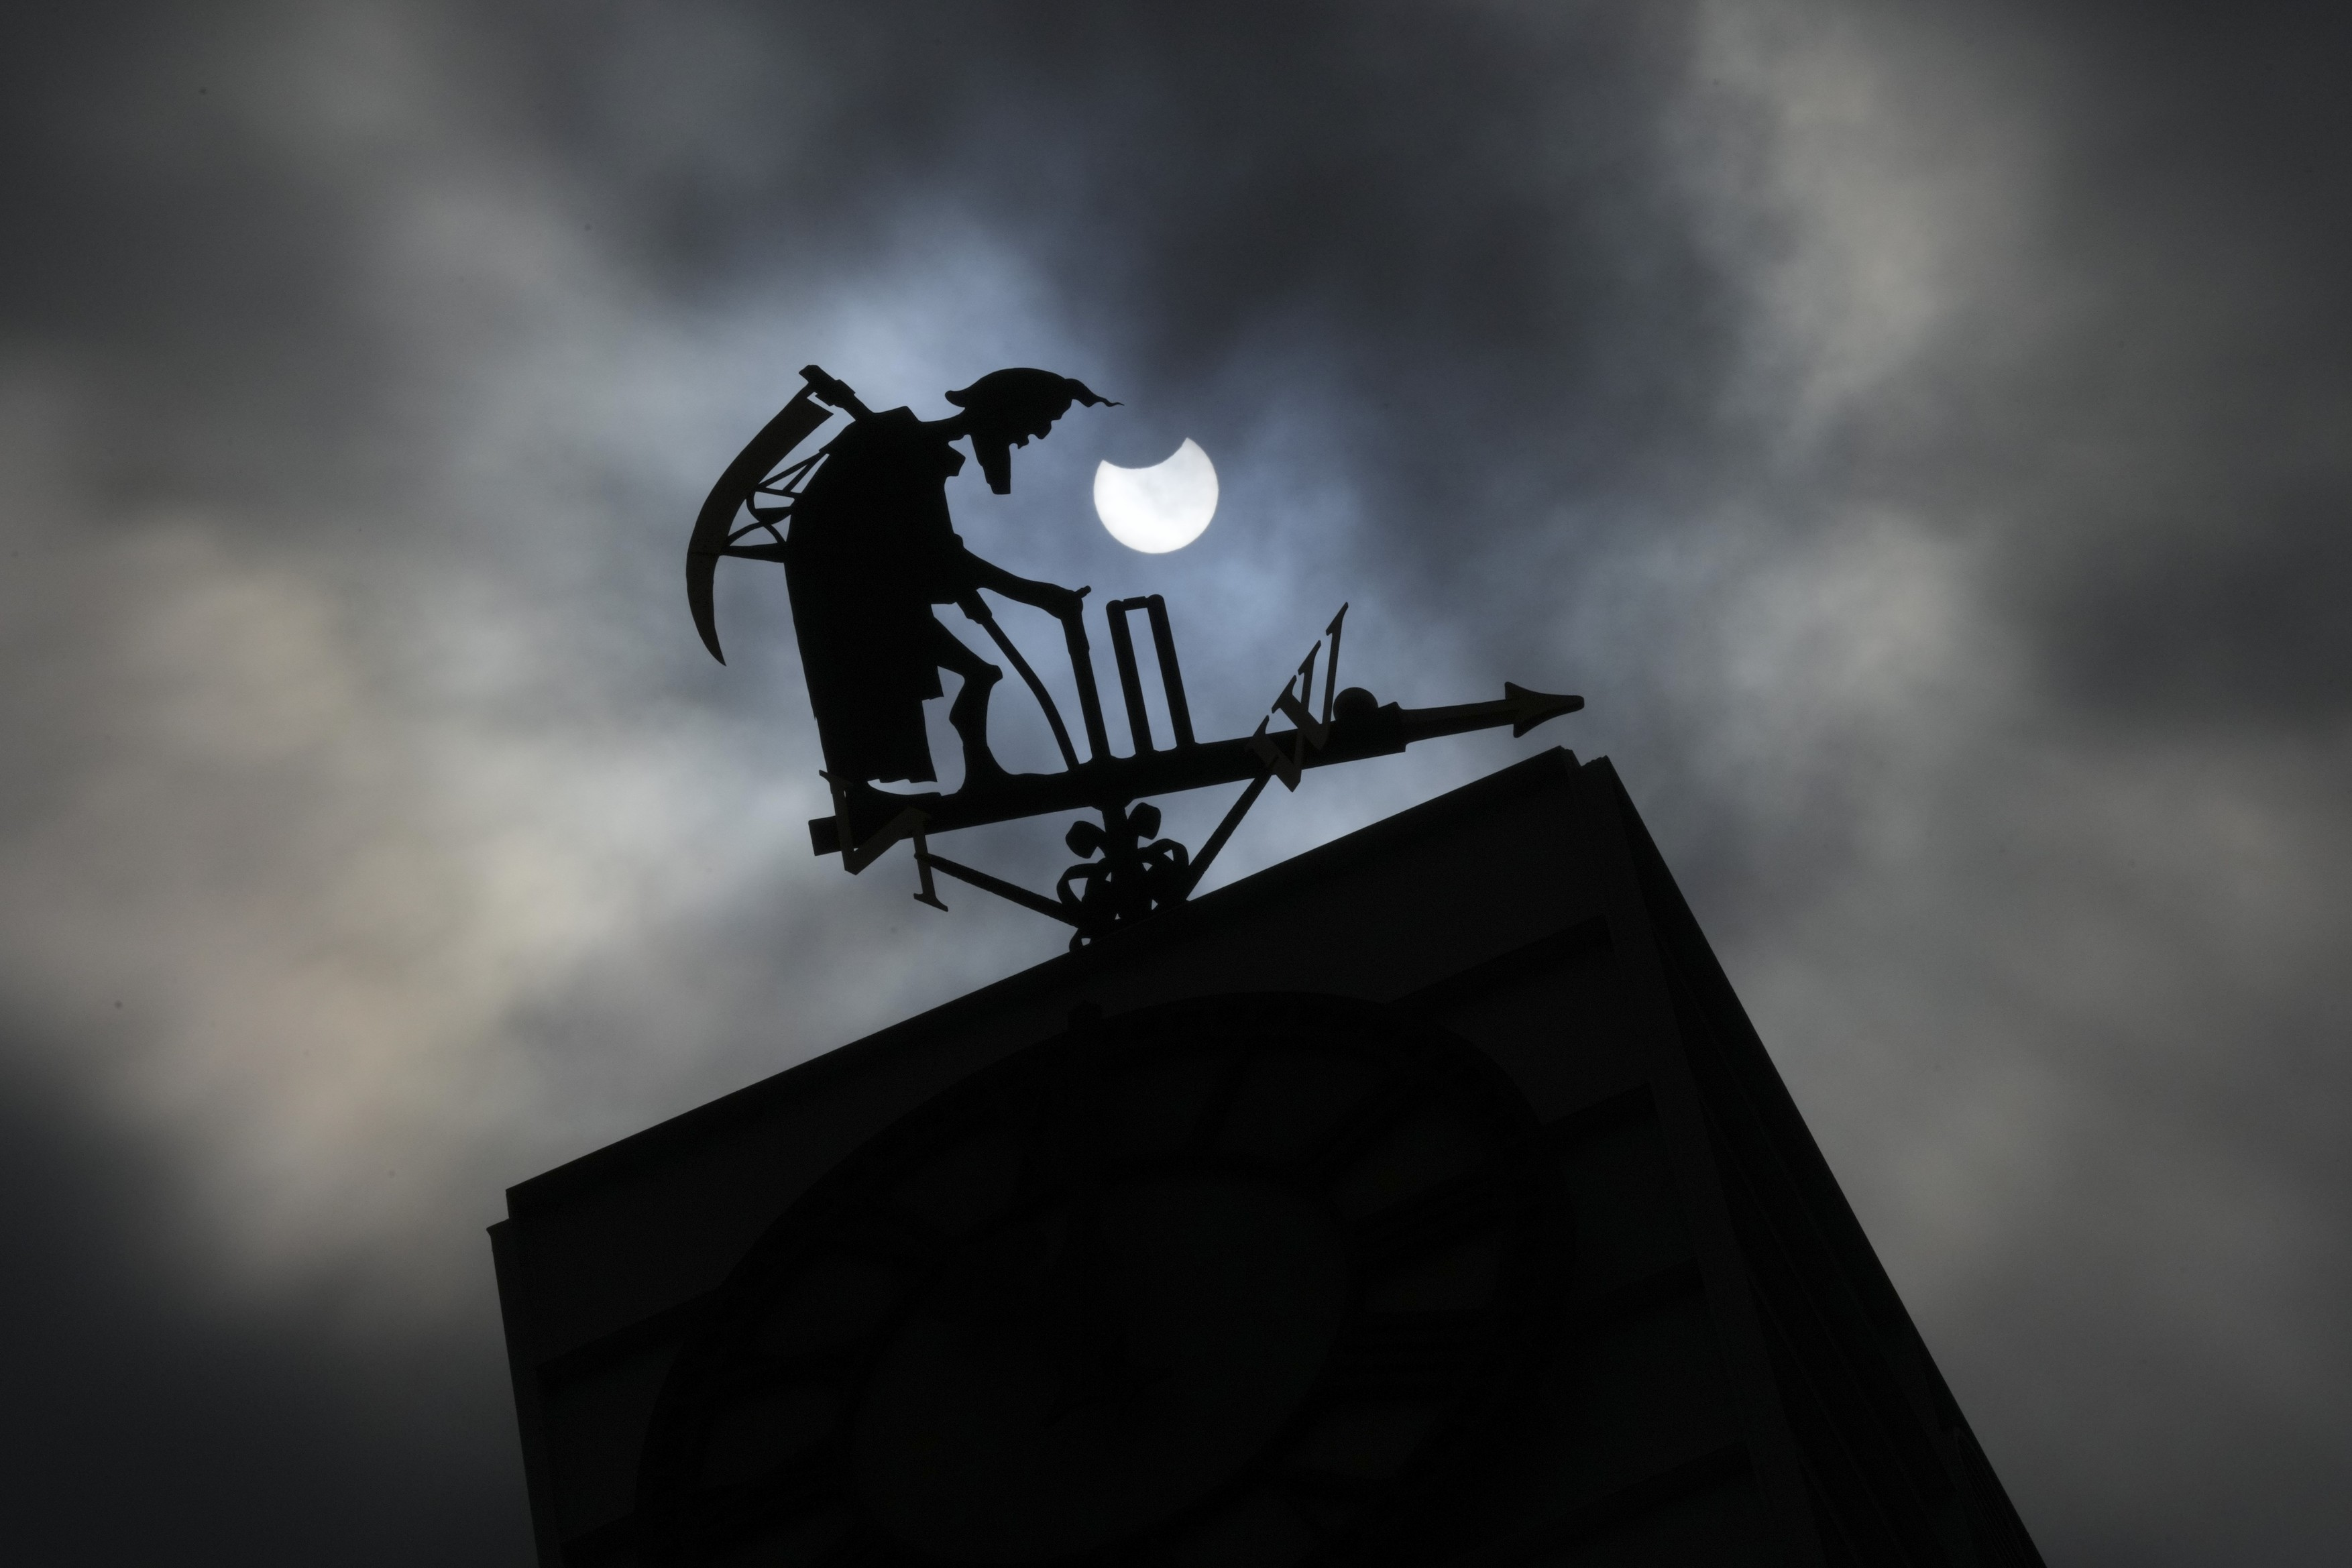 Partial solar eclipse, London, UK - 10 Jun 2021